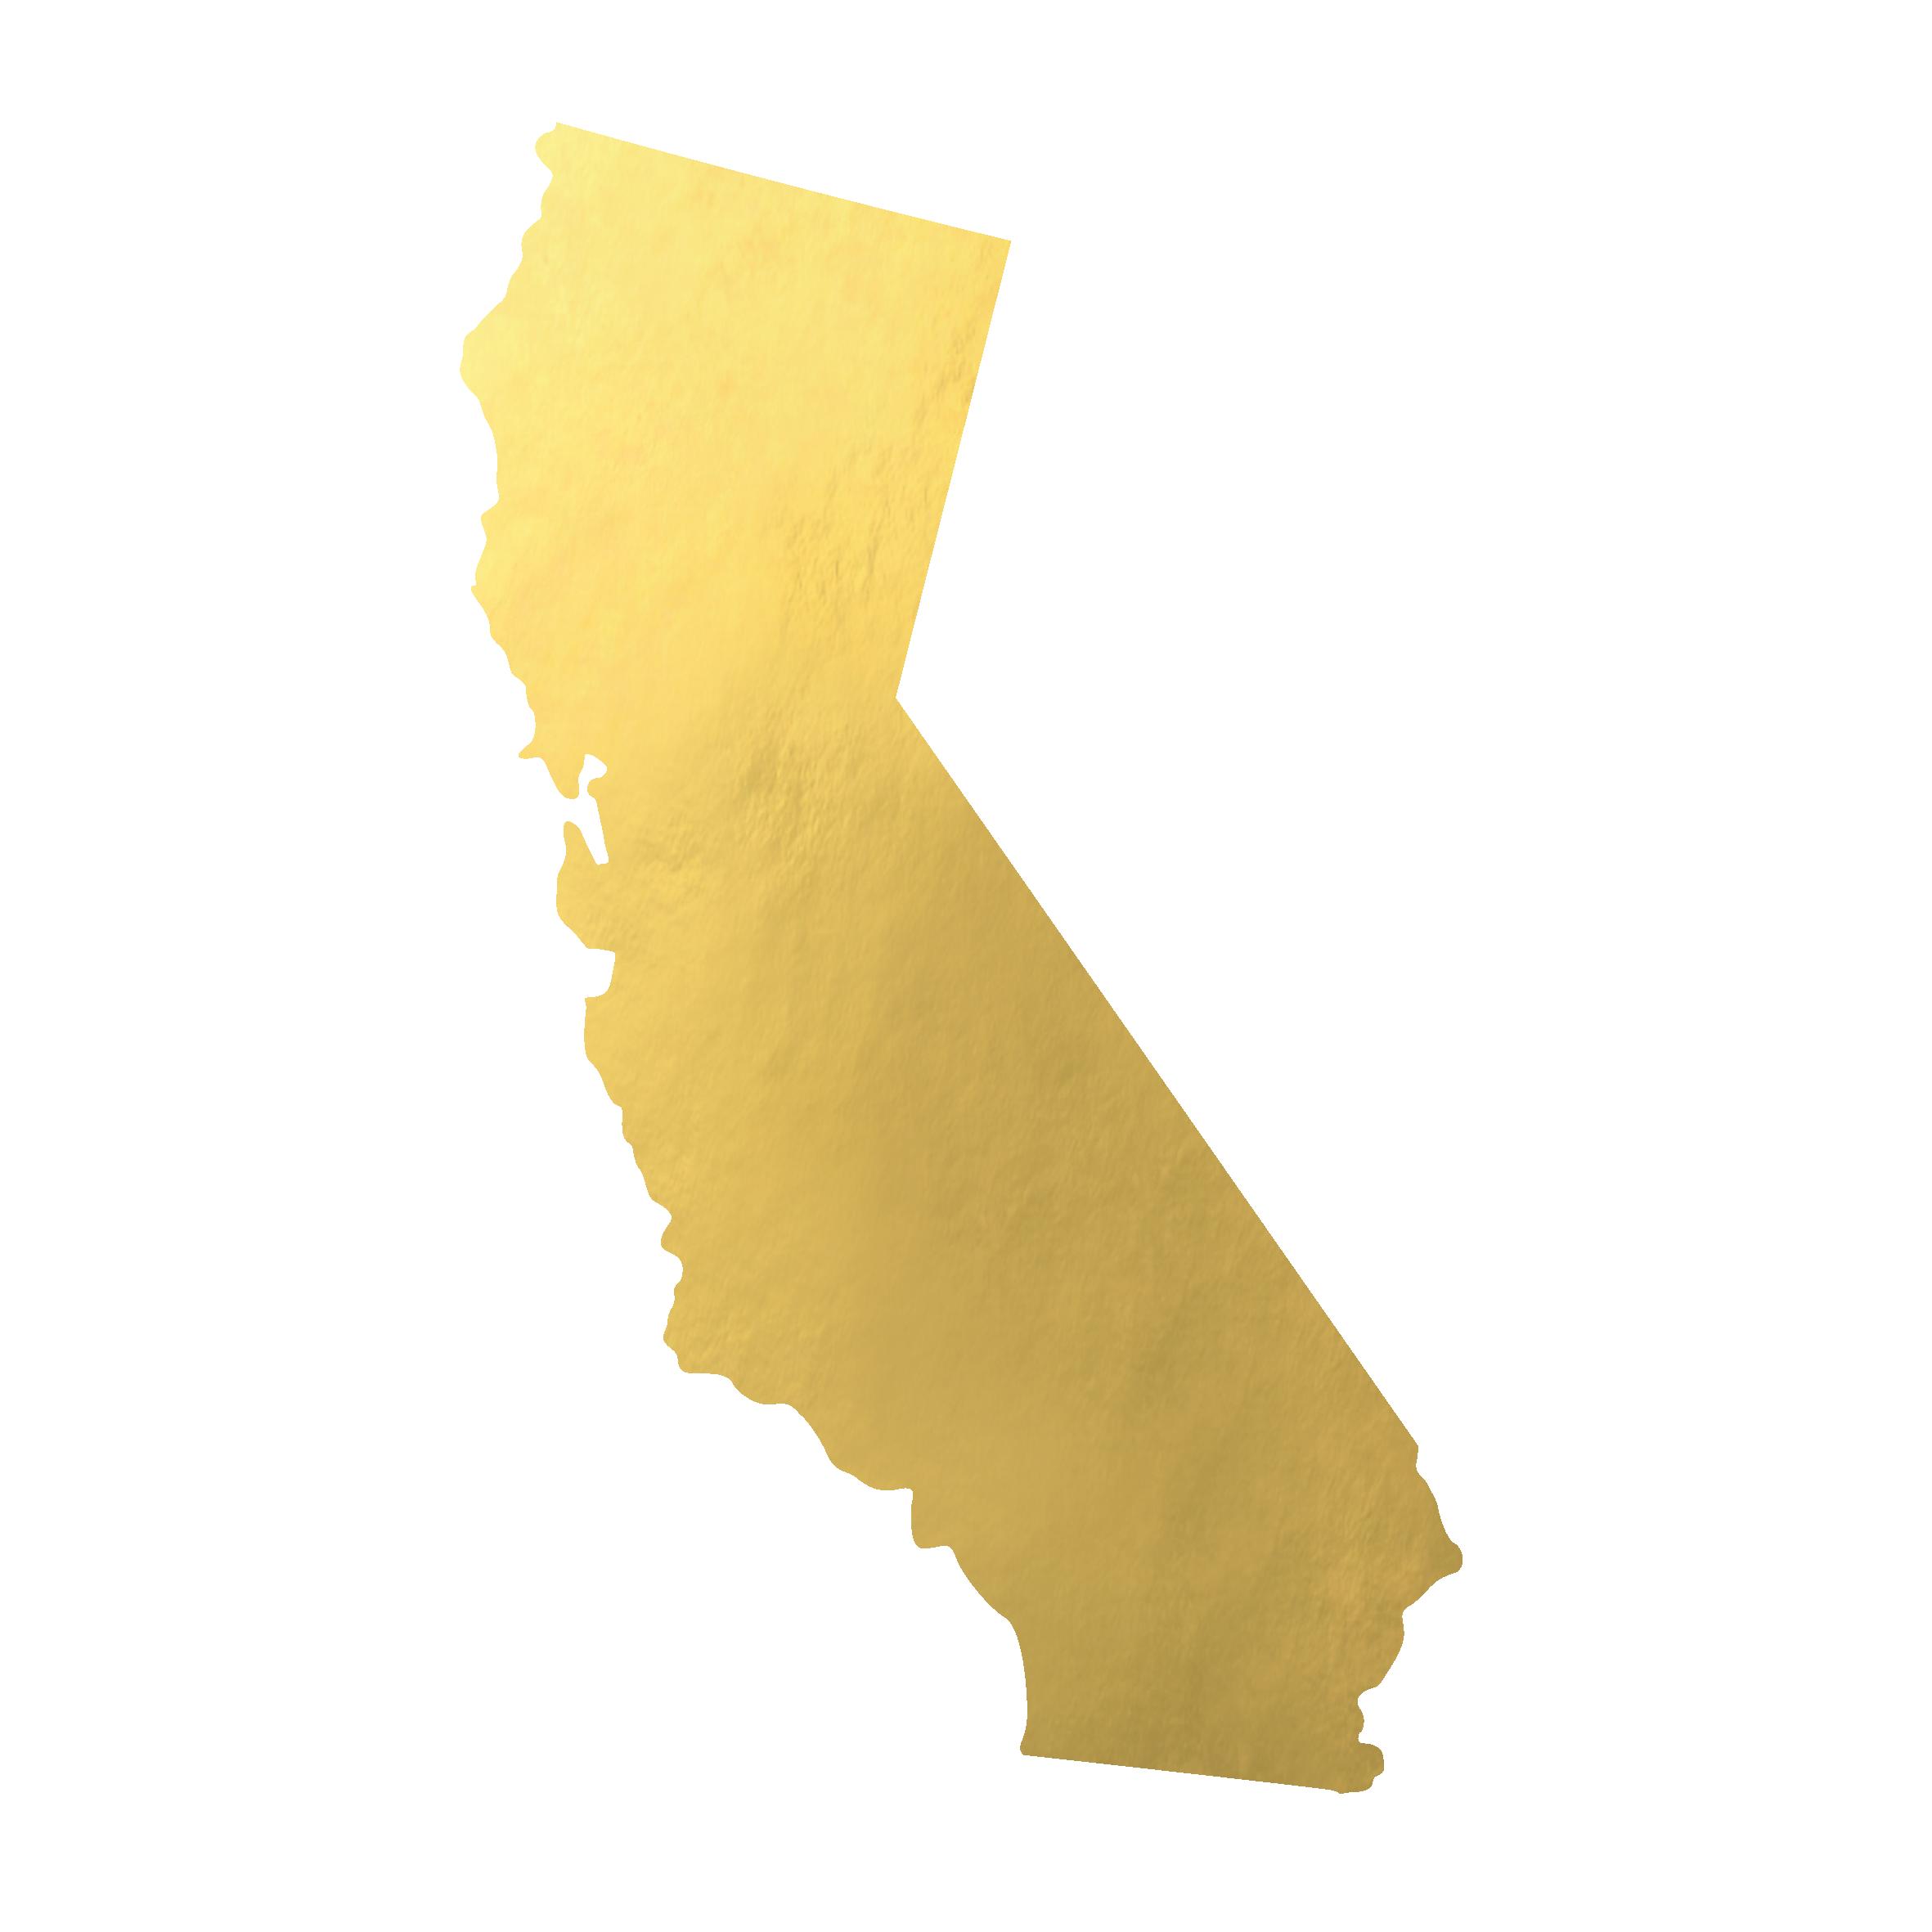 Filters in California Cities